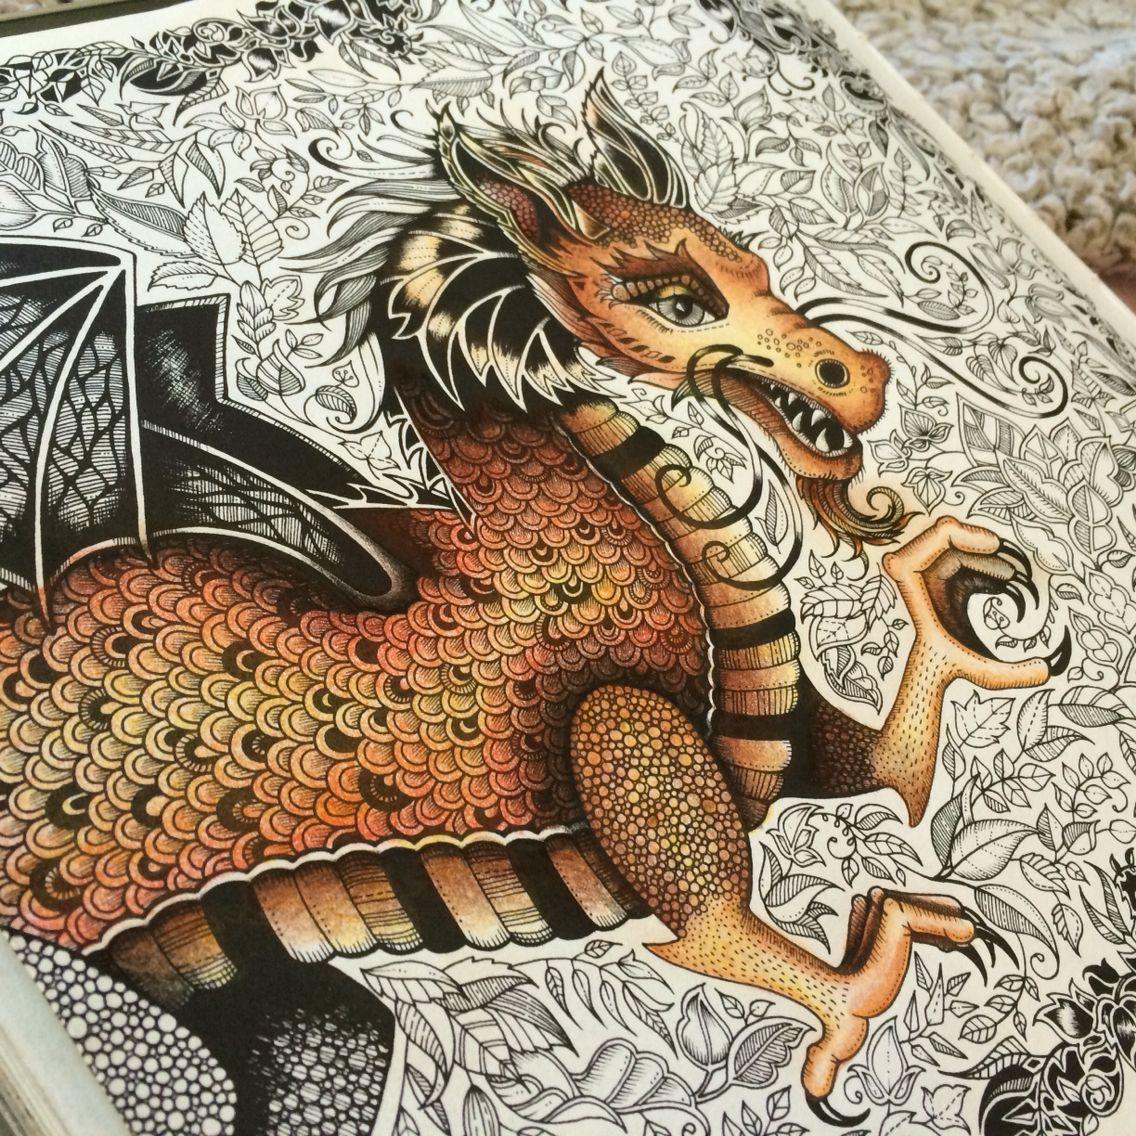 enchanted forest dragon original - photo #3